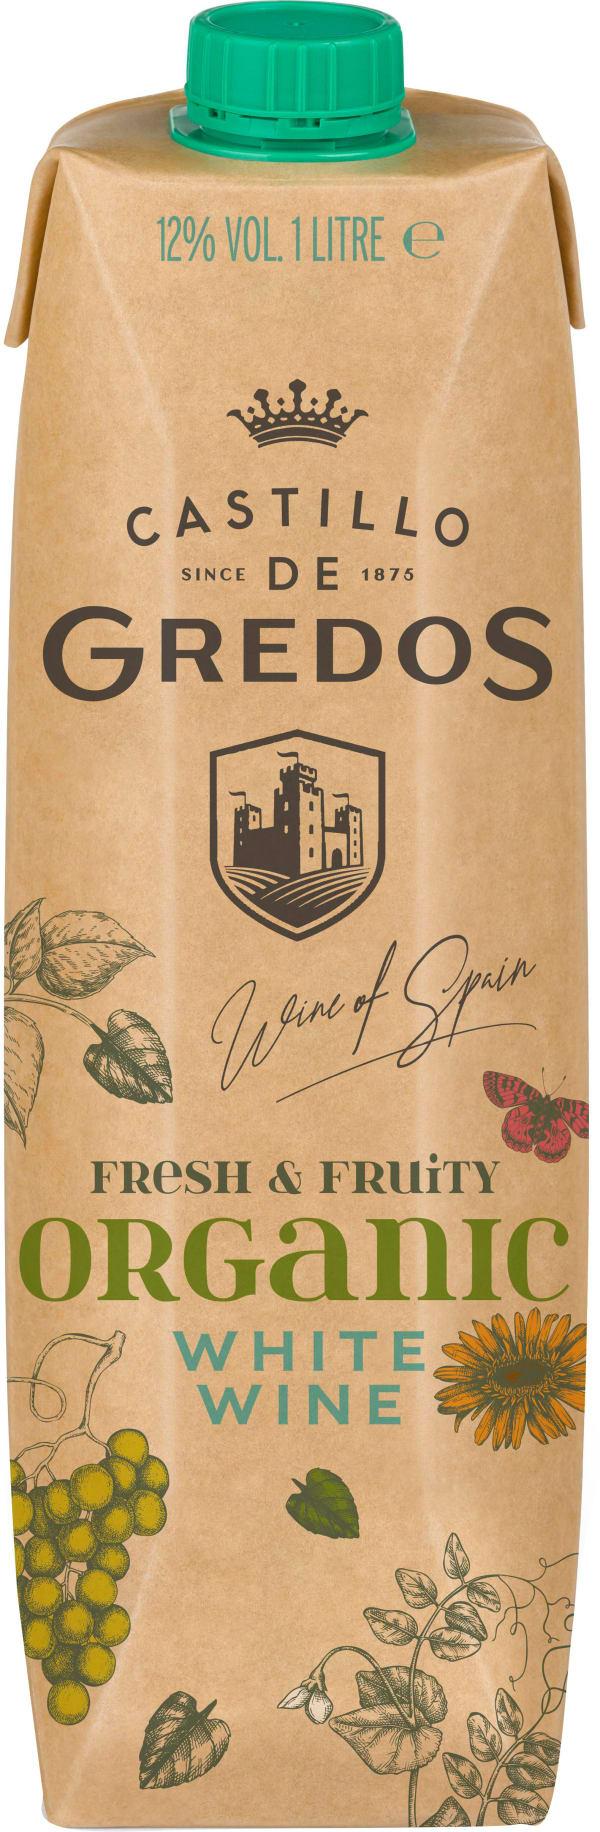 Castillo de Gredos Blanco carton package